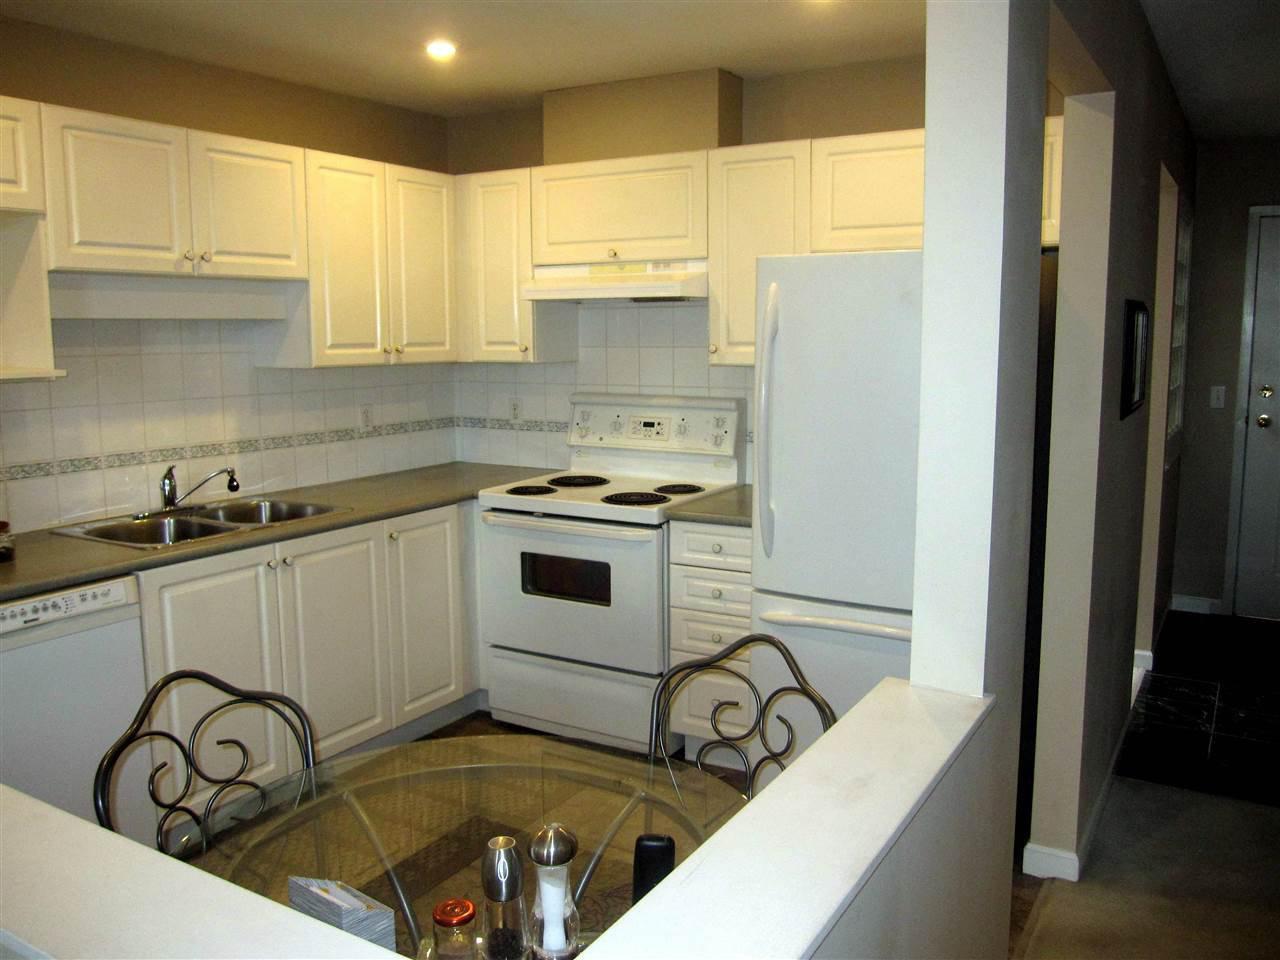 "Photo 5: Photos: 411 12155 191B Street in Pitt Meadows: Central Meadows Condo for sale in ""EDGEPARK MANOR"" : MLS®# R2242064"